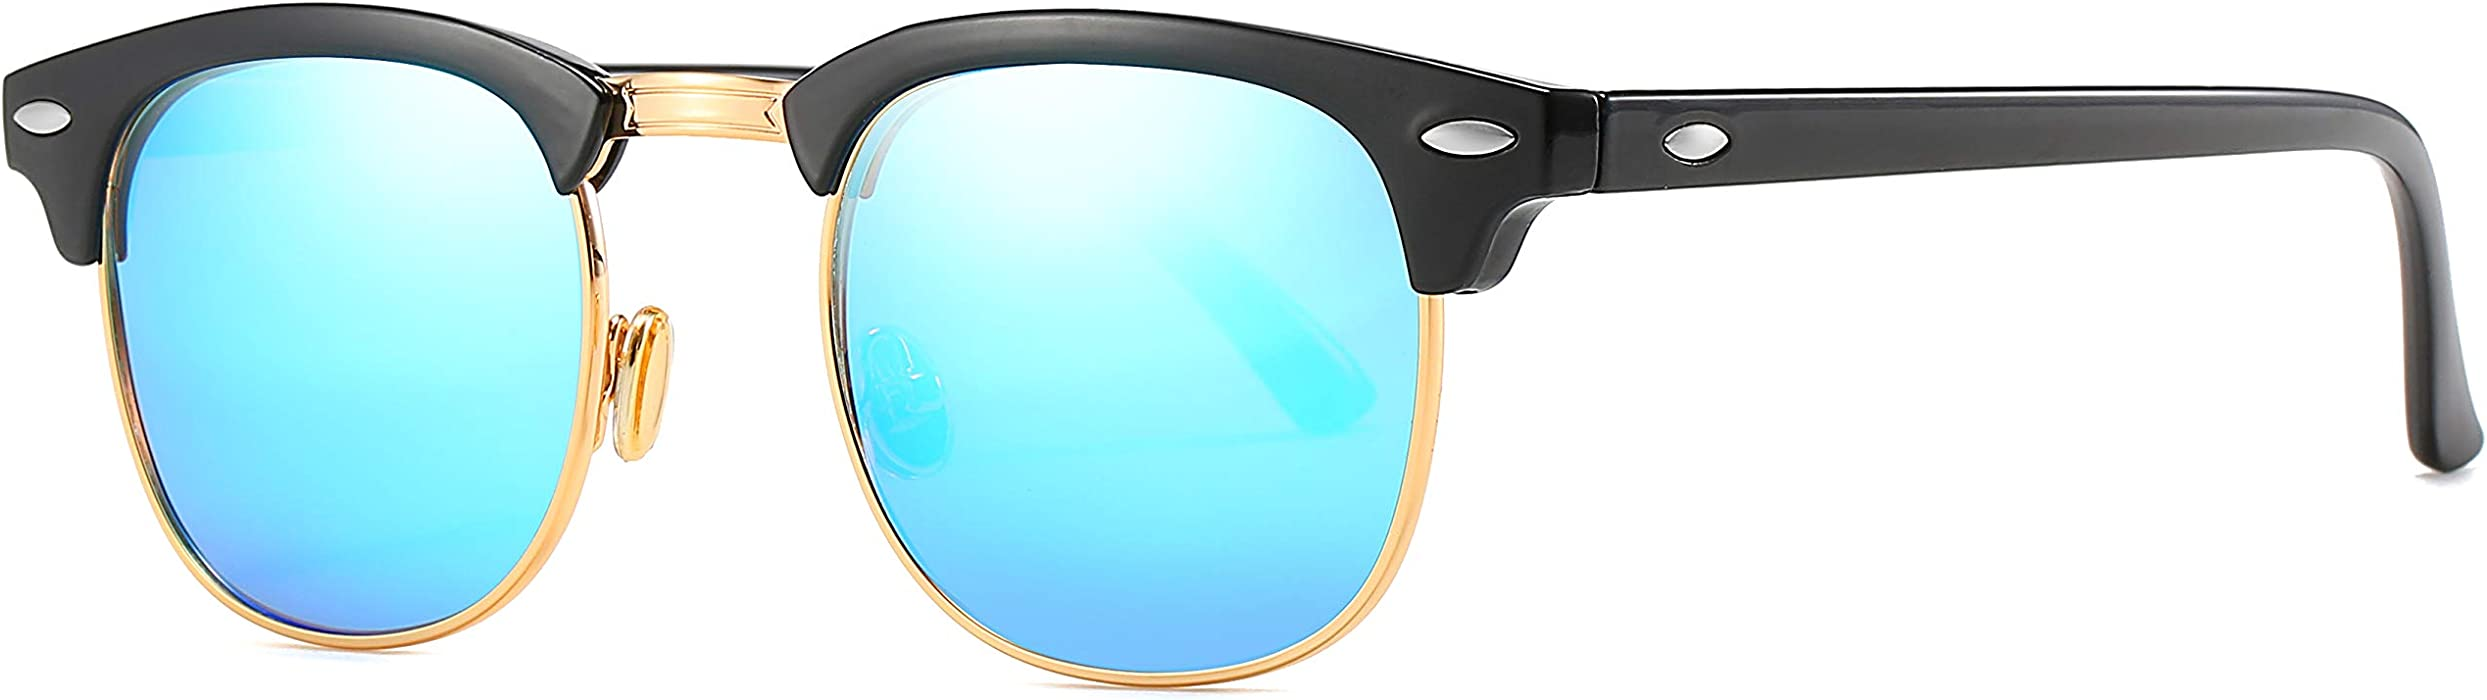 fb8a943545 MAOLEN Retro Polarized lens Sunglasses,Women men Semi Rimless clubmaster  sunglasses (blue)